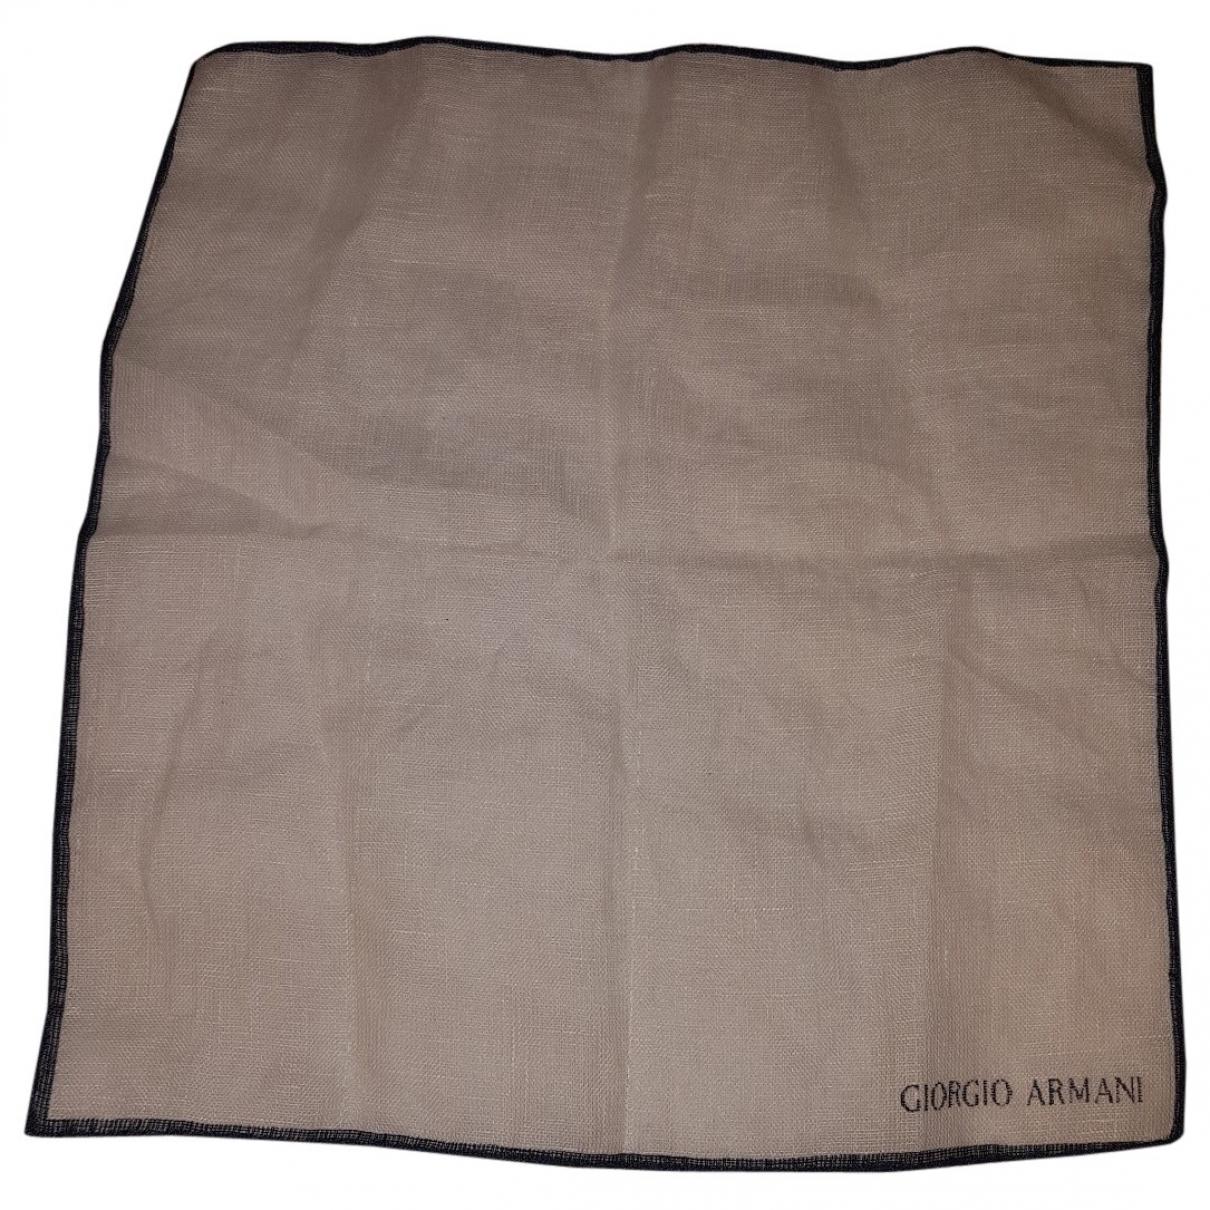 Giorgio Armani \N White Linen scarf & pocket squares for Men \N